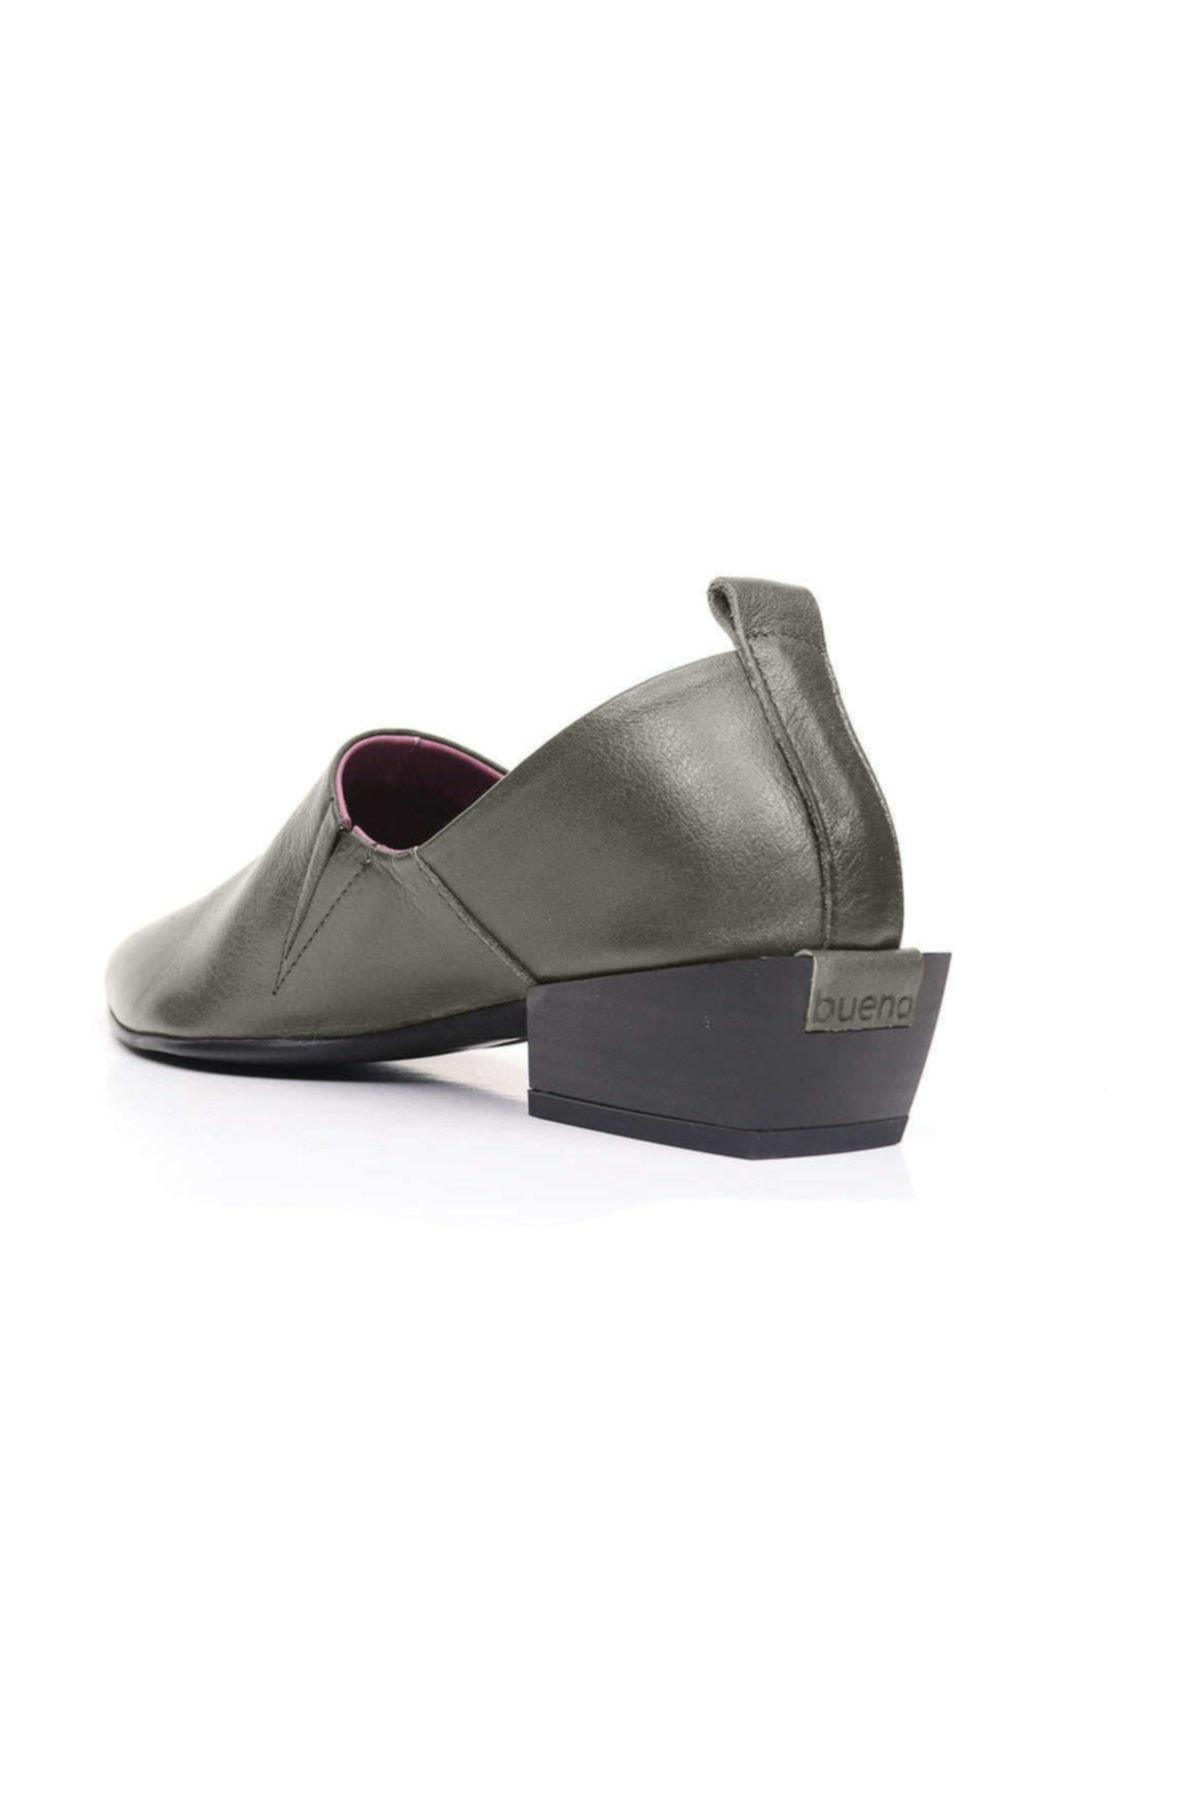 BUENO Shoes  Kadın Ayakkabı 9p7112 2